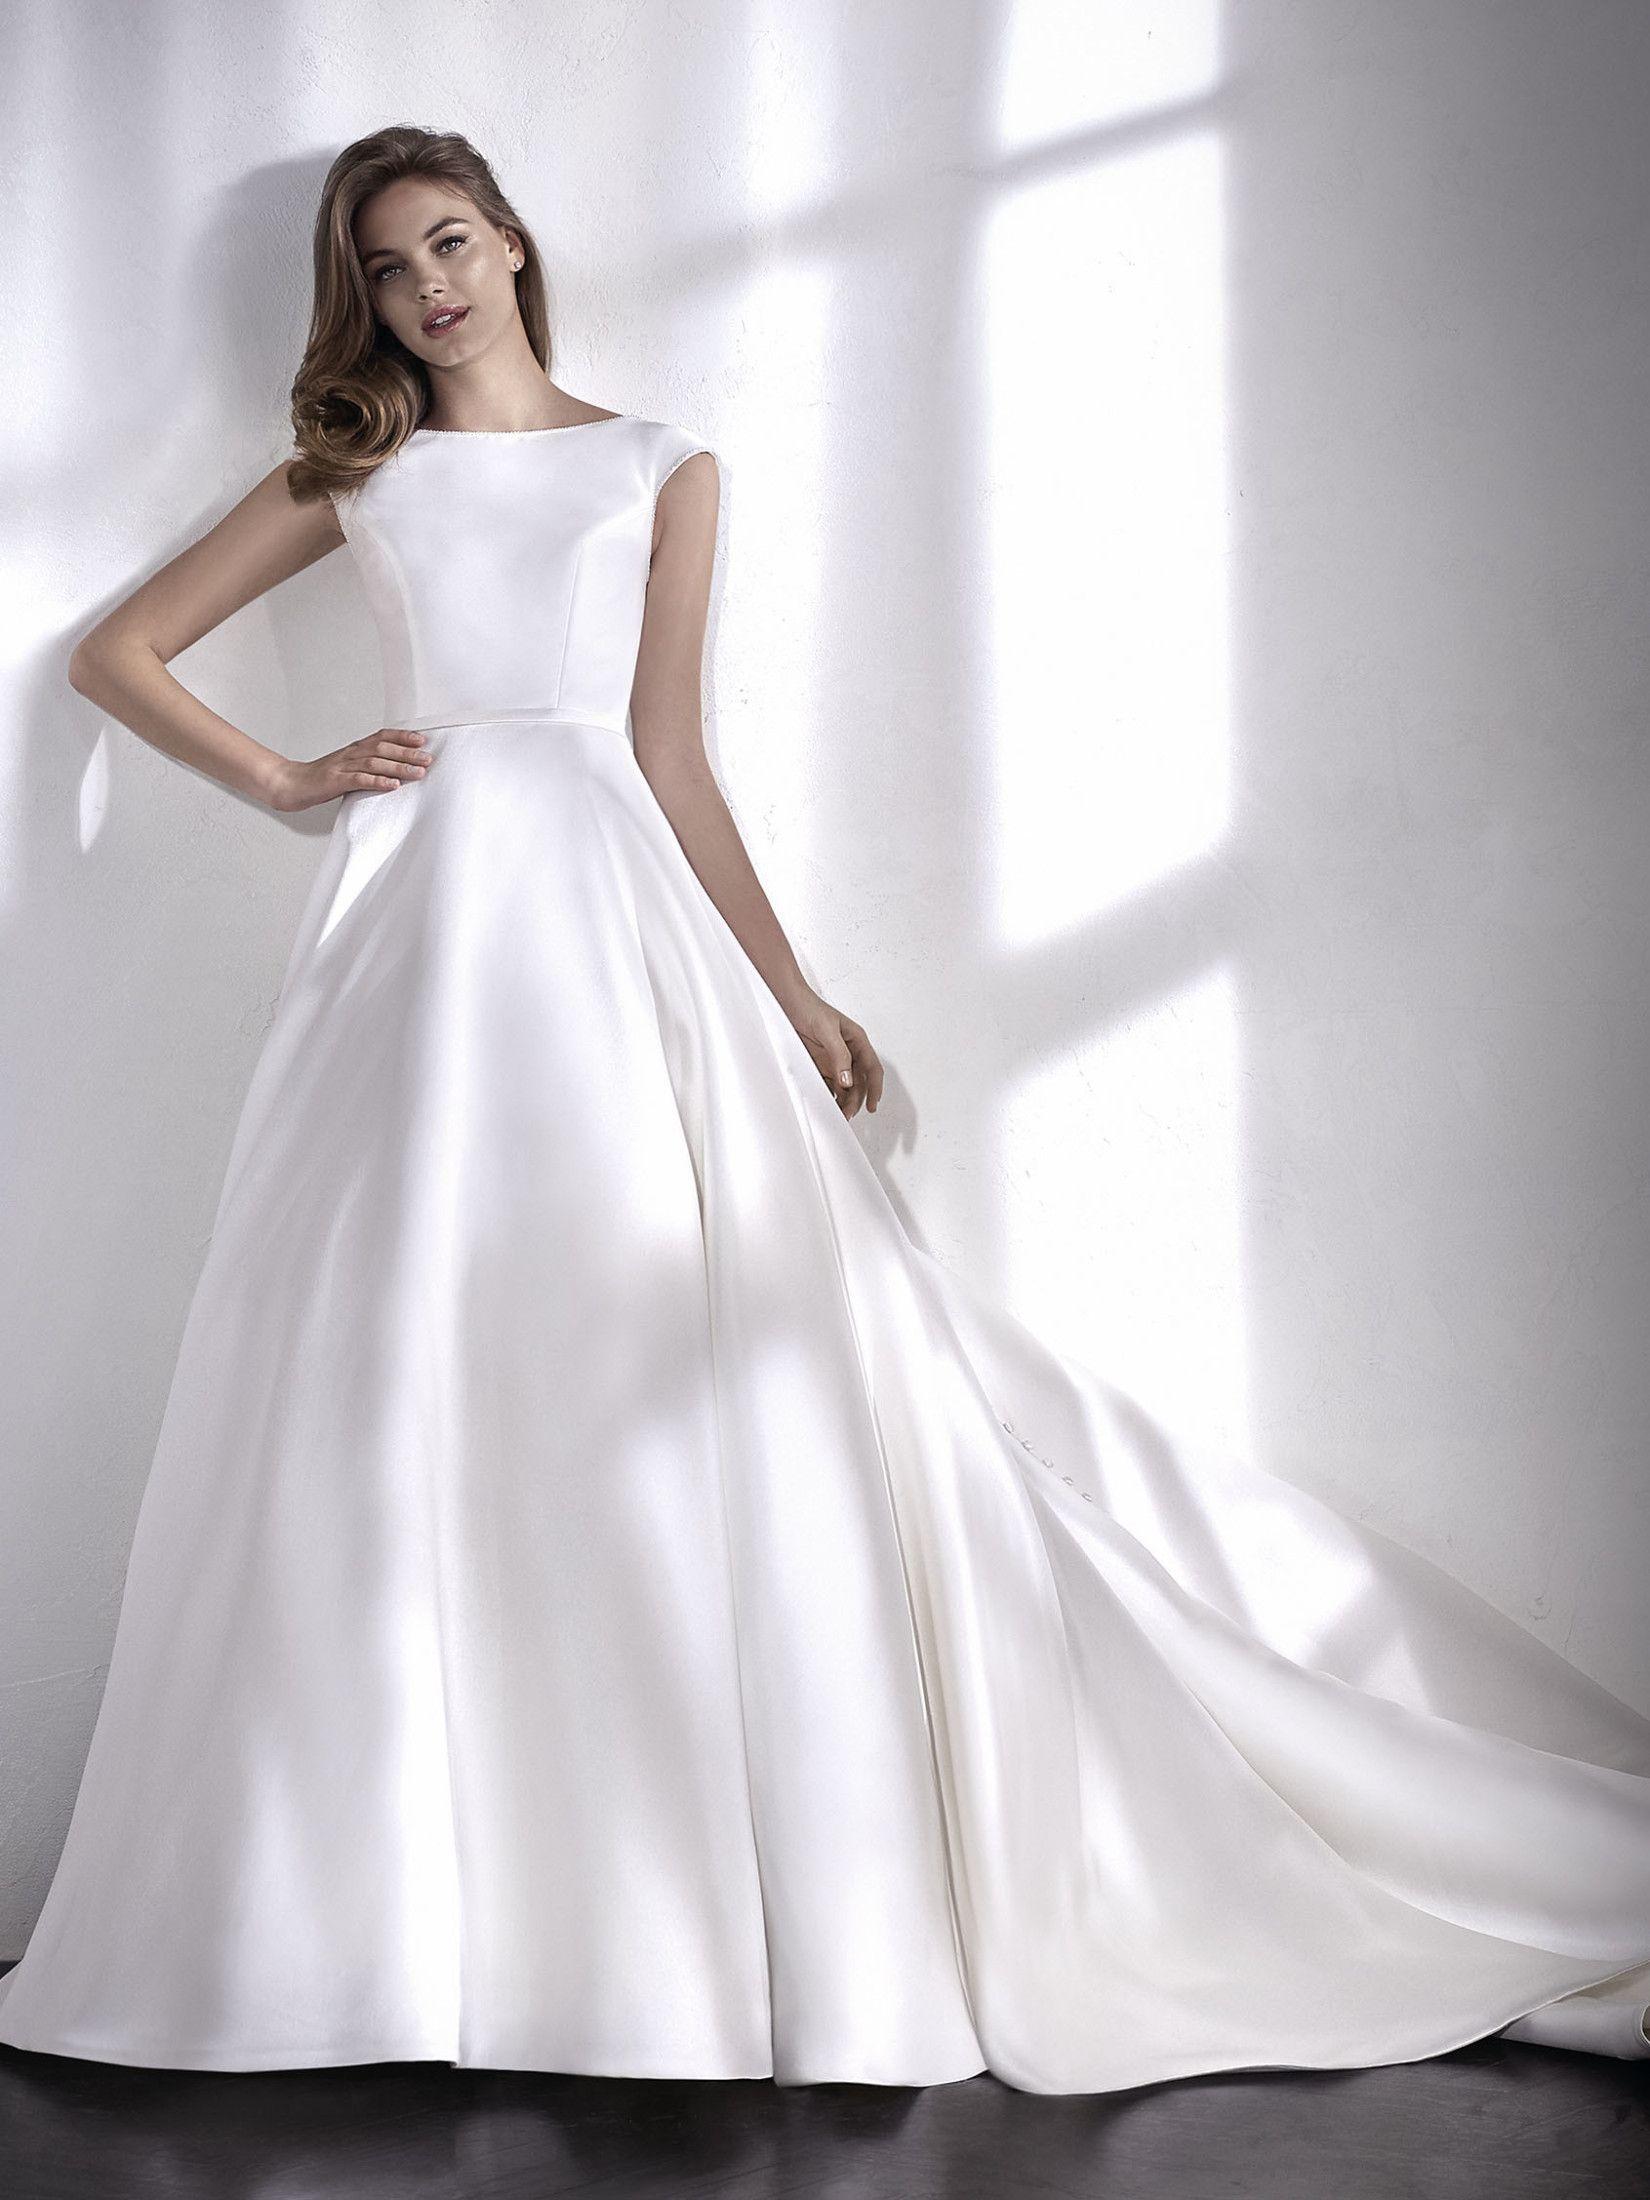 Plain Simple Wedding Dress Wedding Dresses Wedding Dress Blog St Patrick Wedding Dress